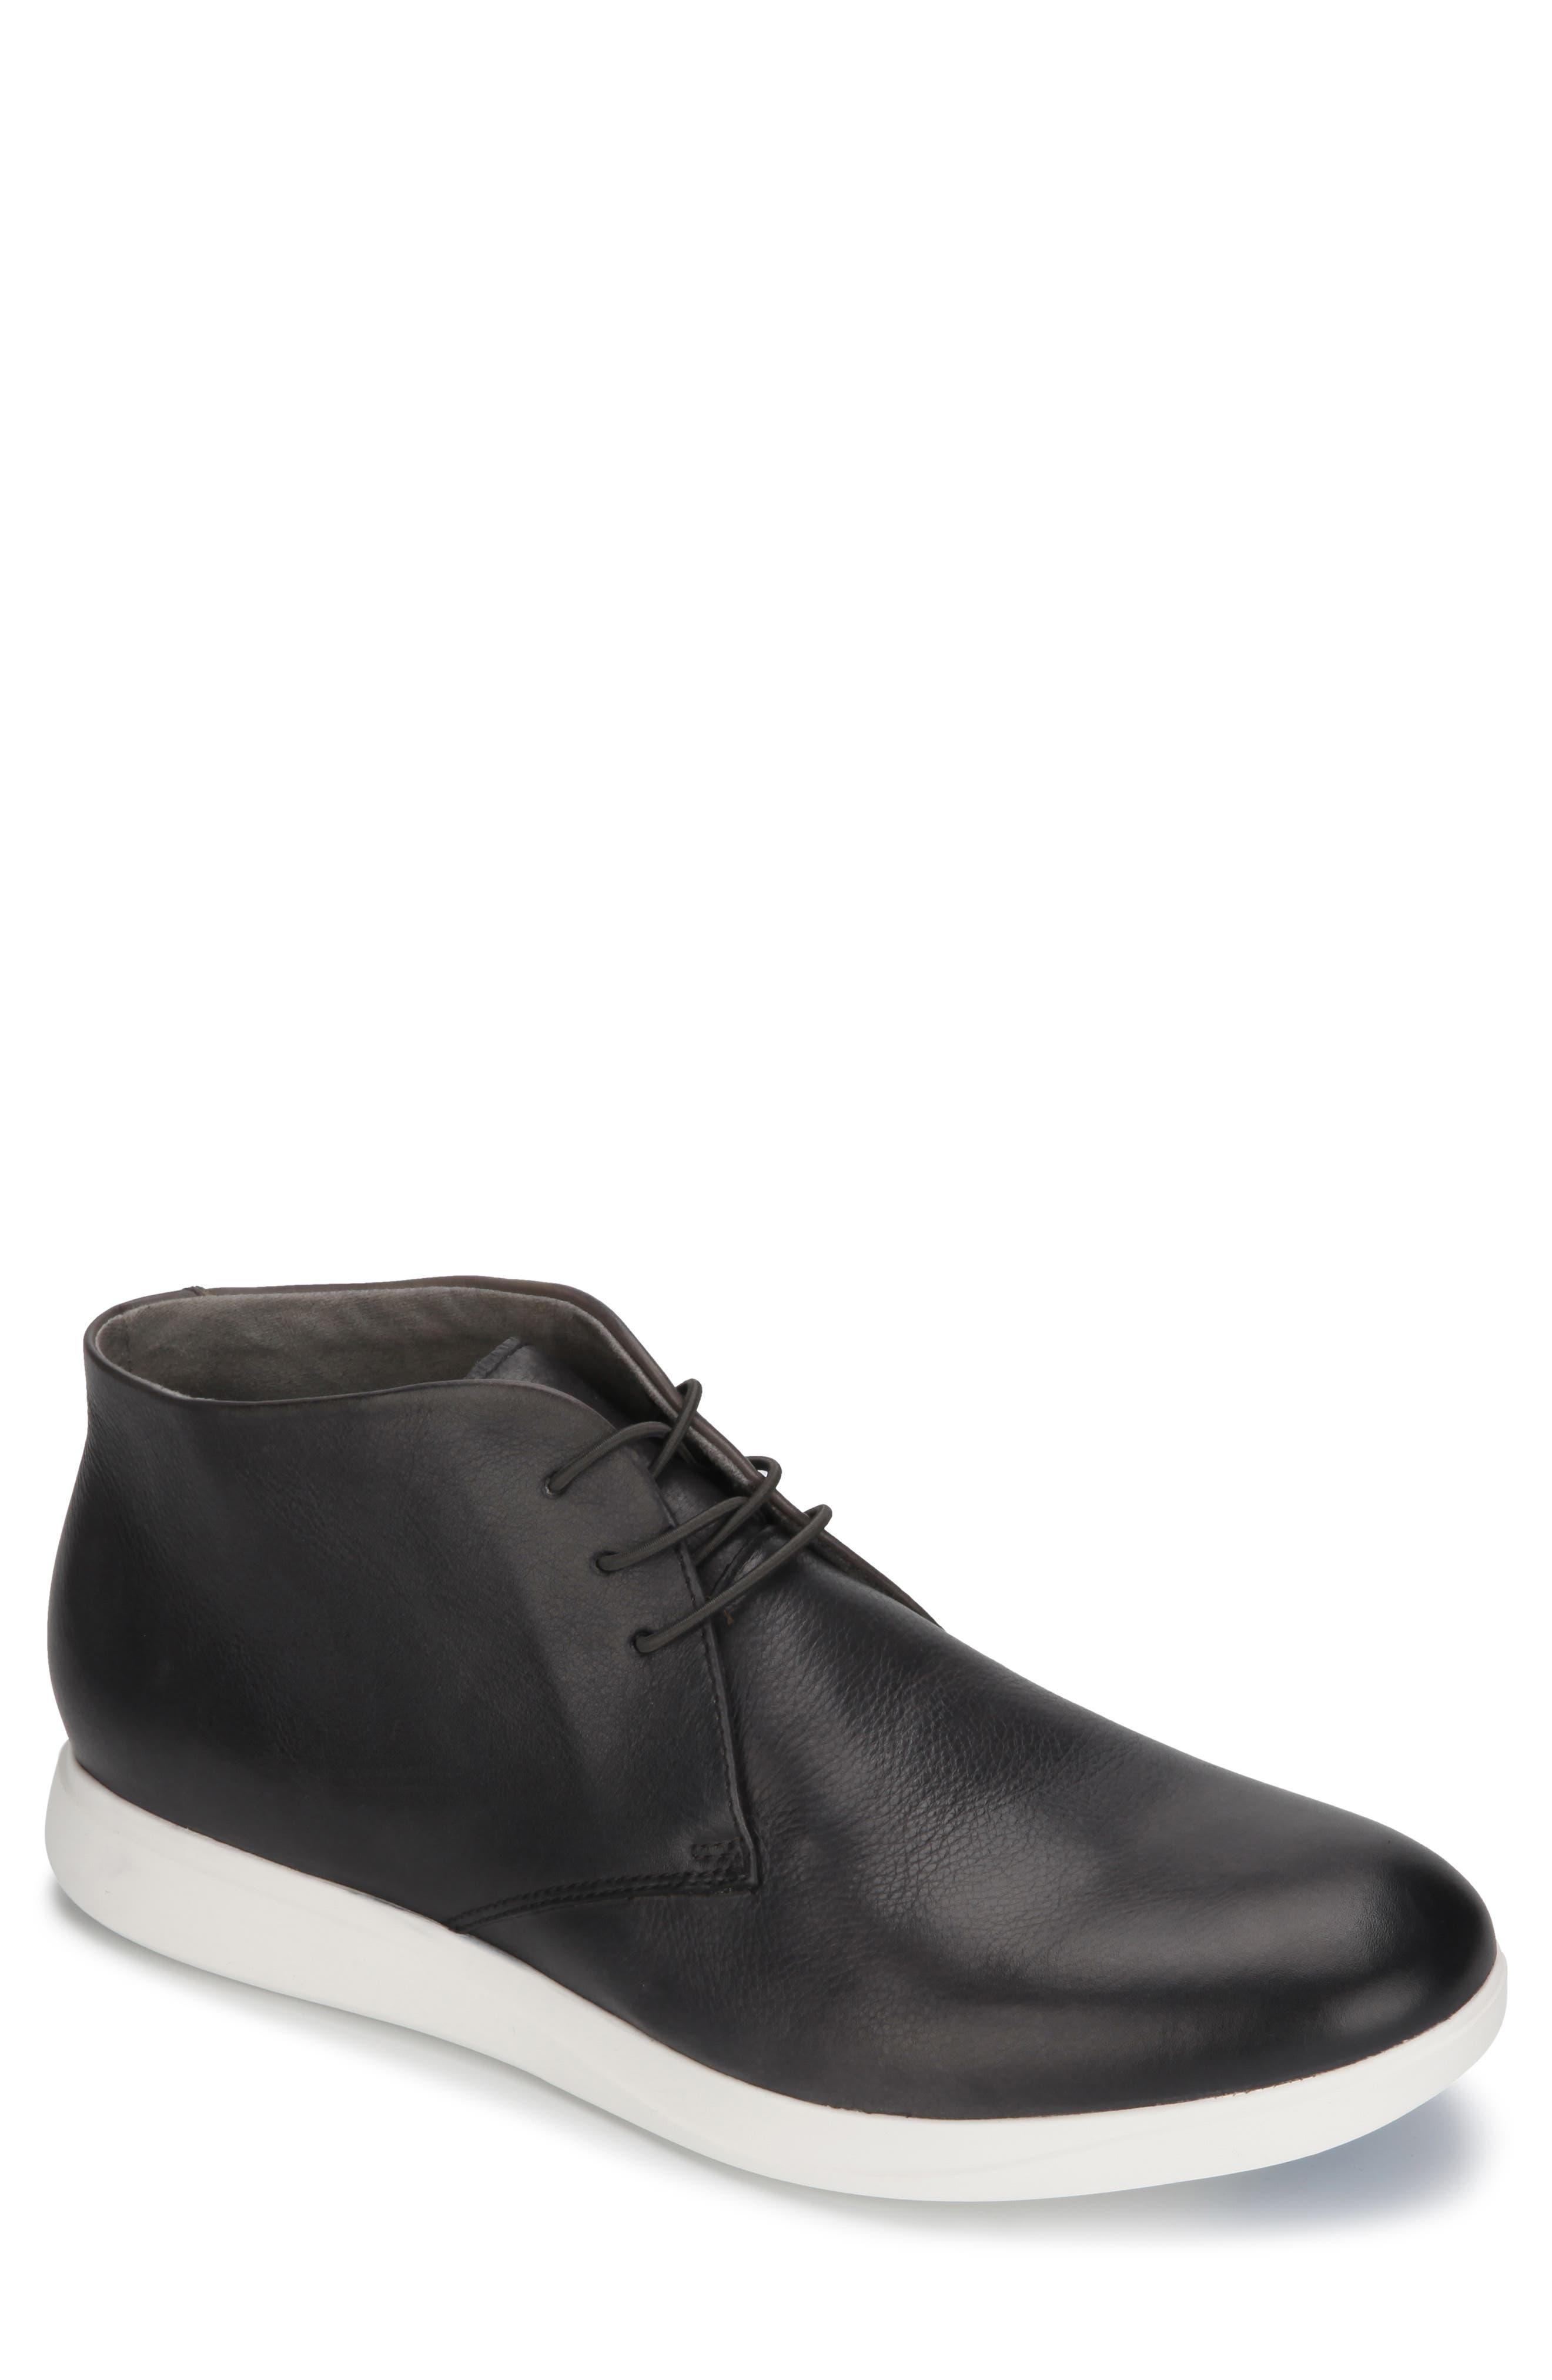 KENNETH COLE NEW YORK, Rocketpod Chukka Sneaker, Main thumbnail 1, color, GREY TUMBLED LEATHER